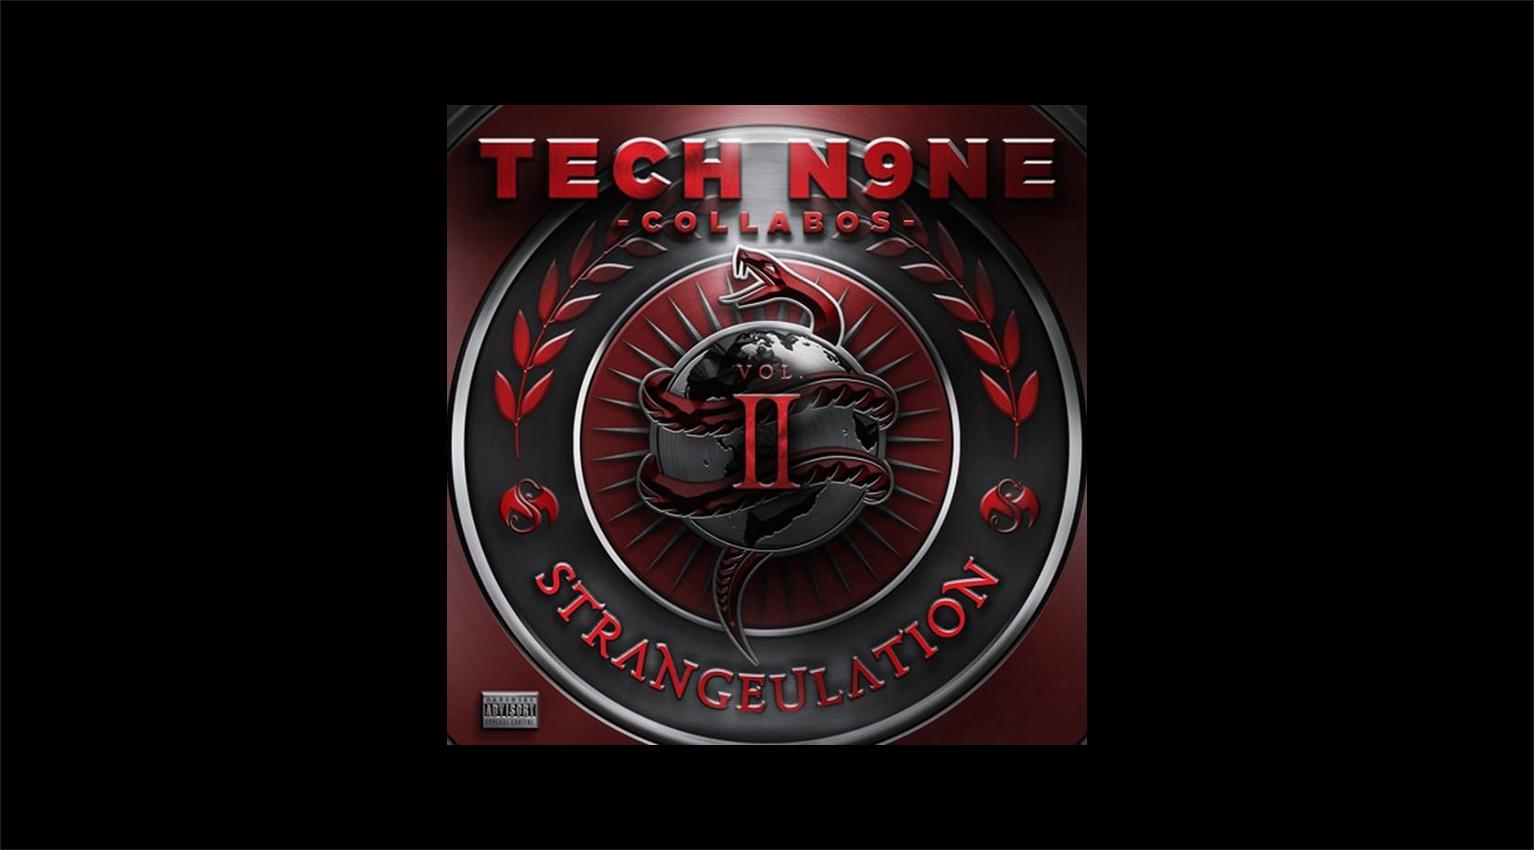 Tech N9ne Quot We Just Wanna Party Quot Ft Rittz Amp Darrein